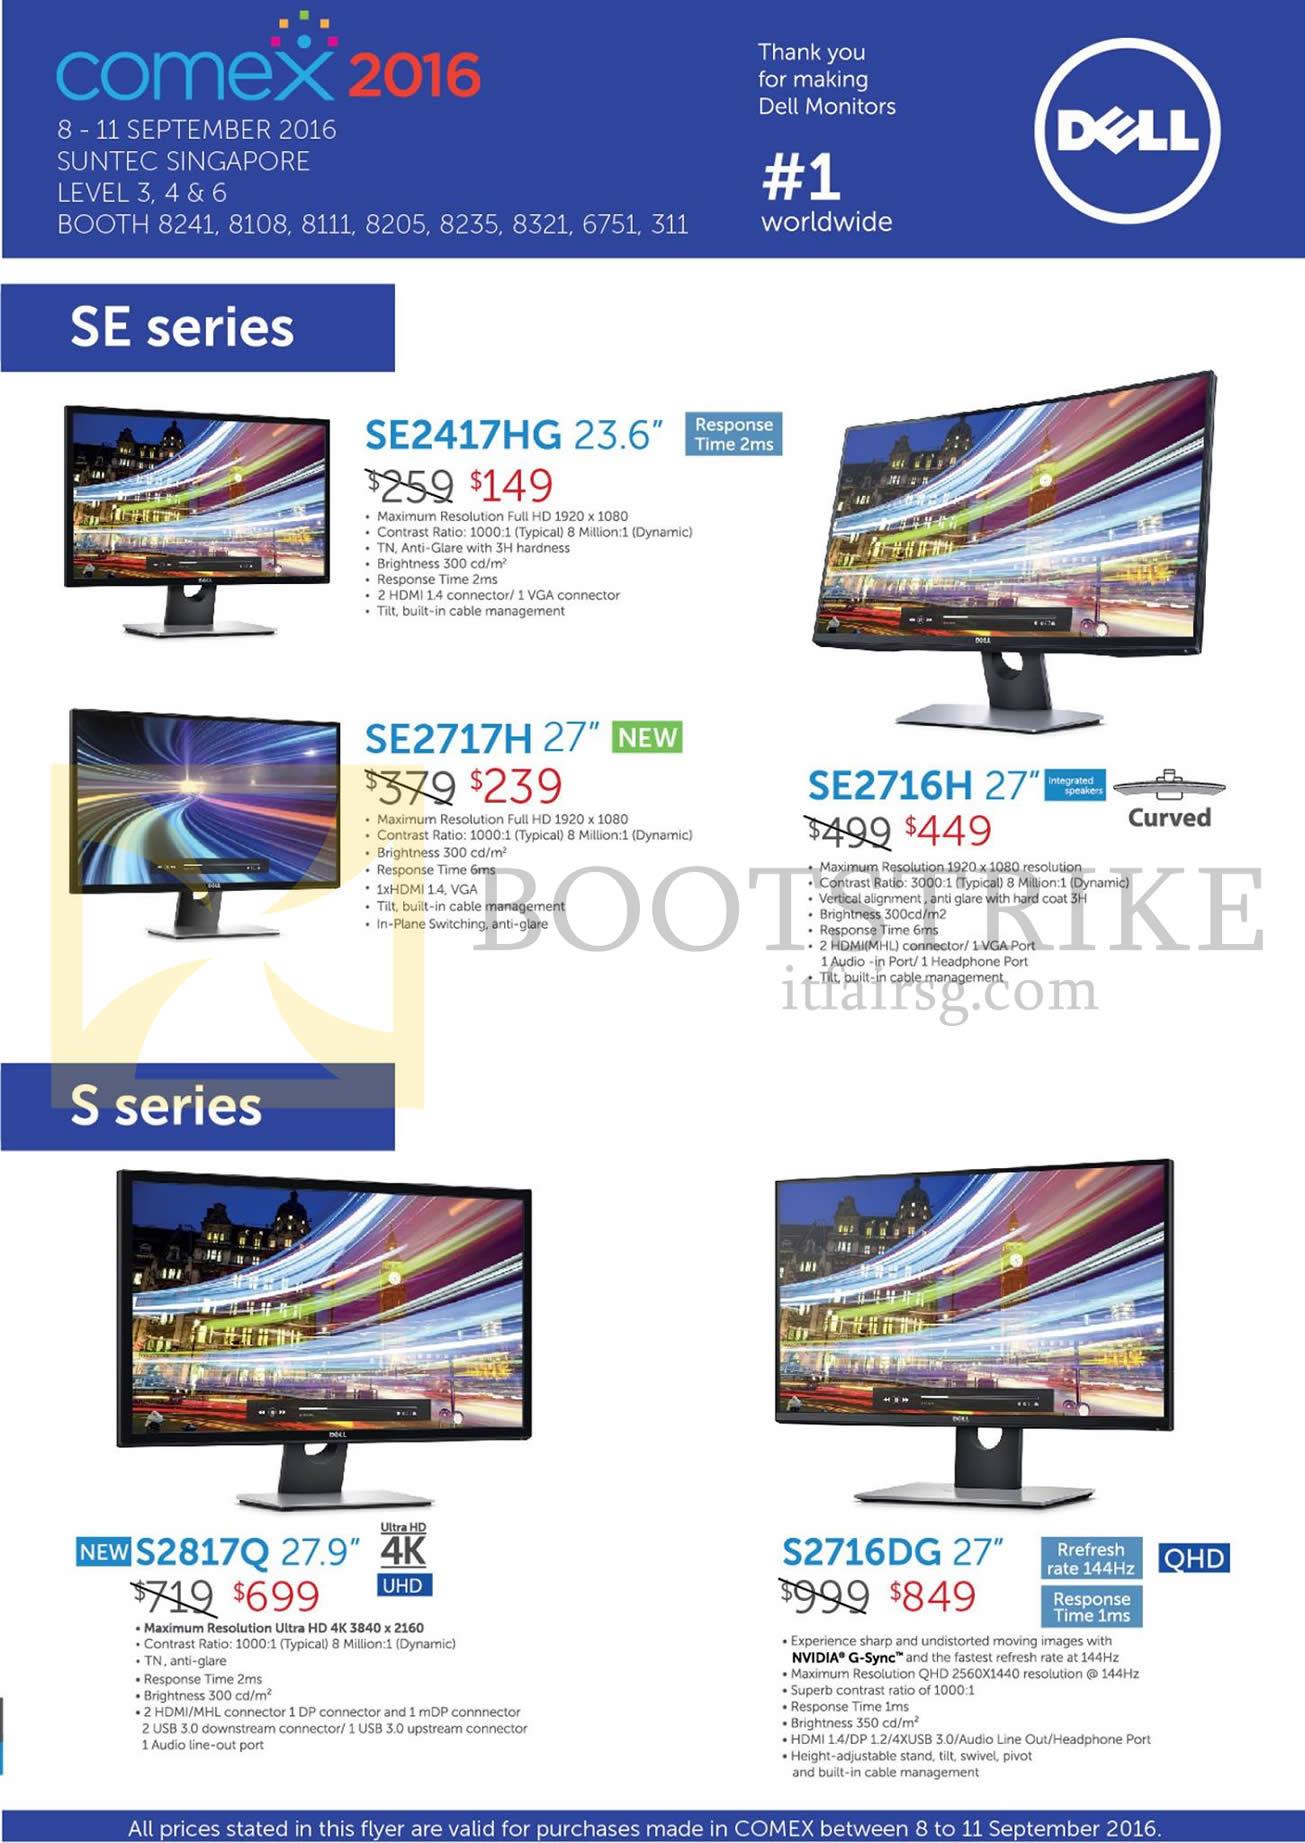 COMEX 2016 price list image brochure of Dell Monitors SE2417HG, SE2717H, SE2716H, S2817Q, S2716DG